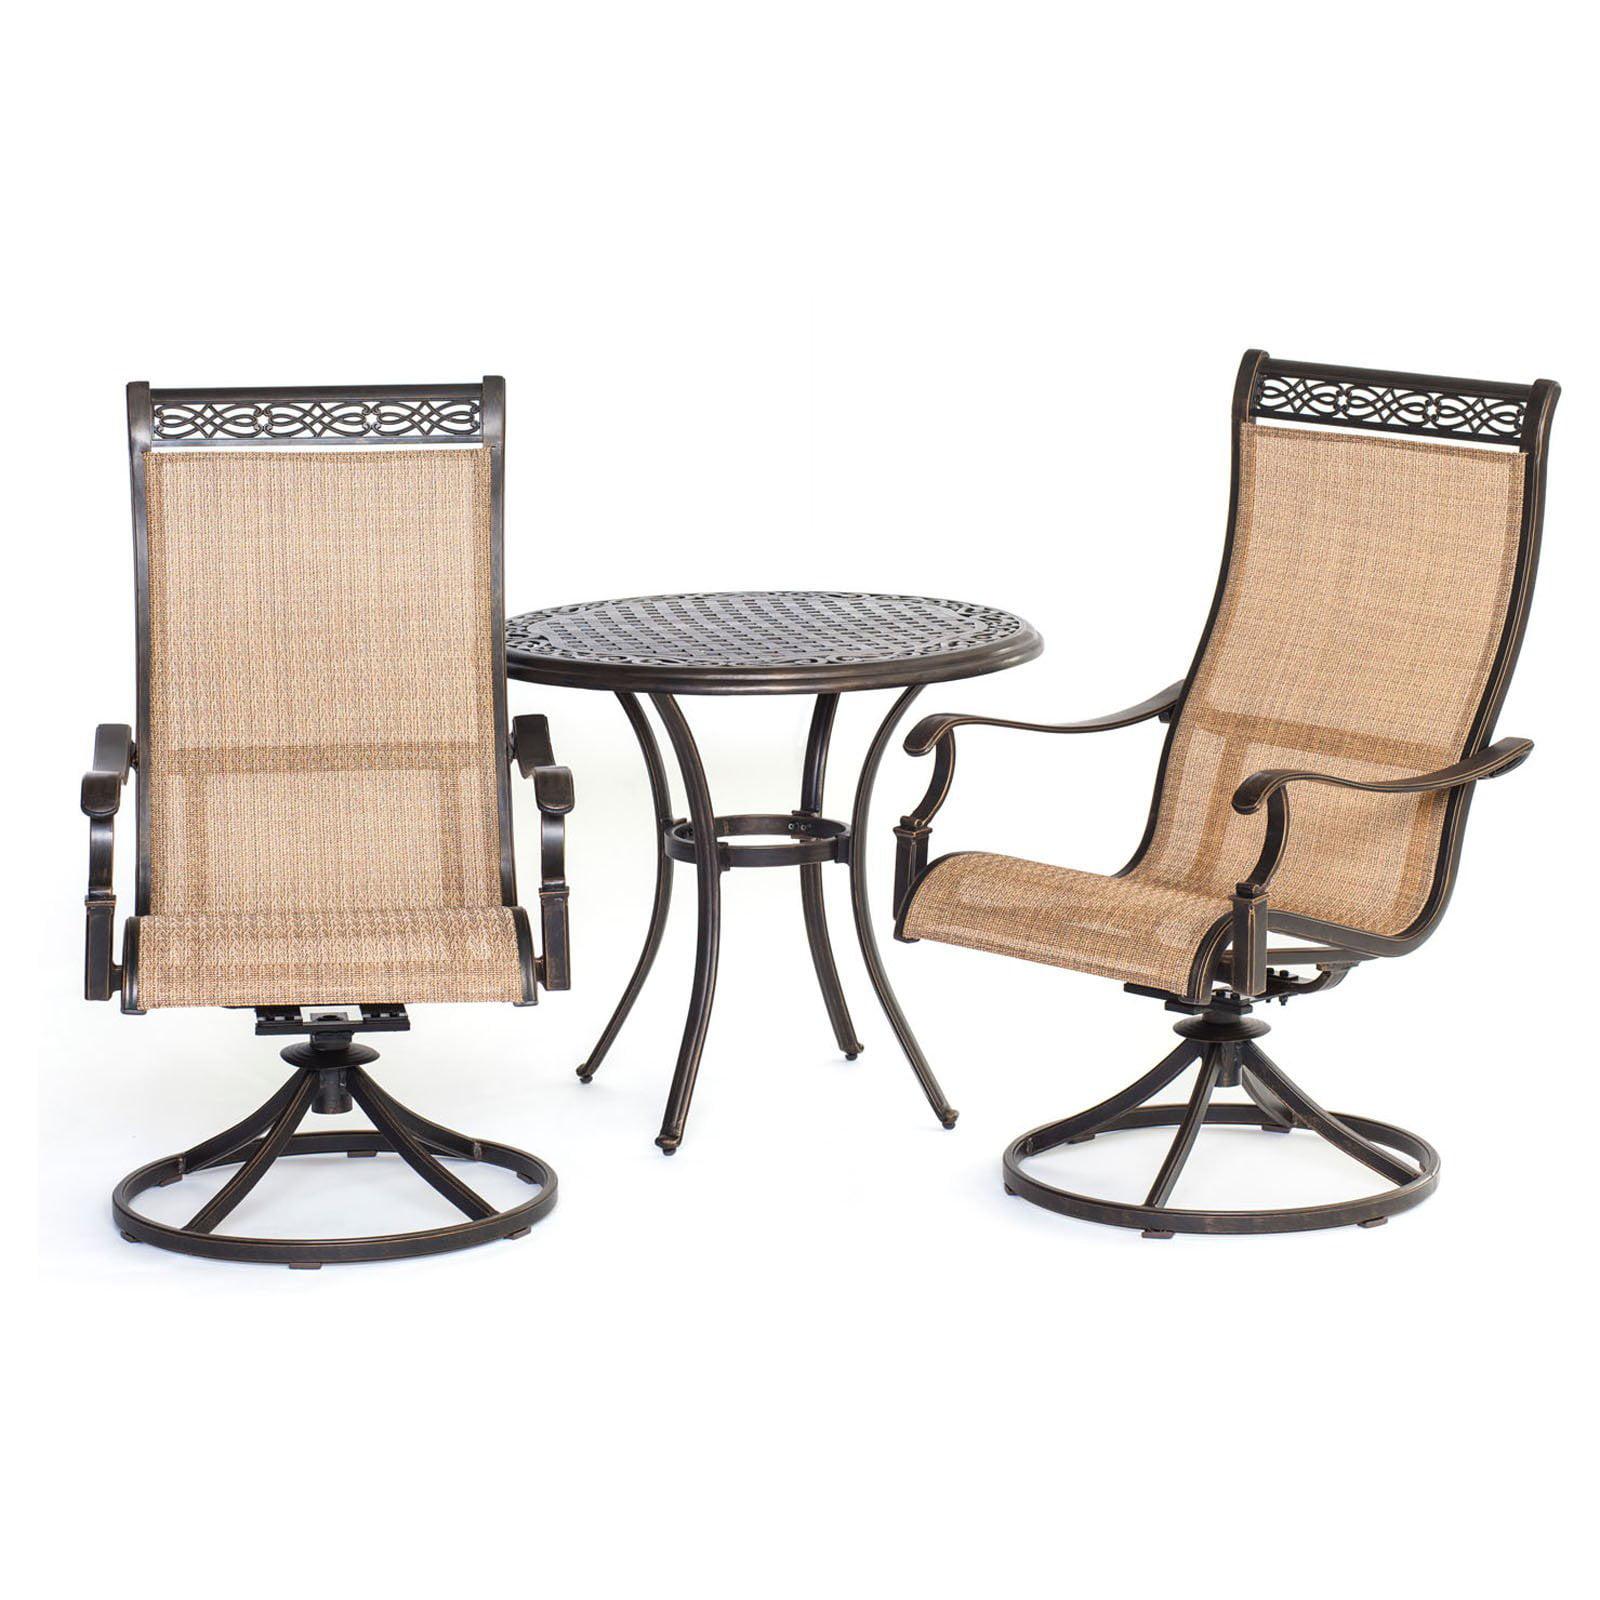 Hanover Outdoor Manor 3-Piece Bistro Set, Cedar/Bronze - Walmart.com